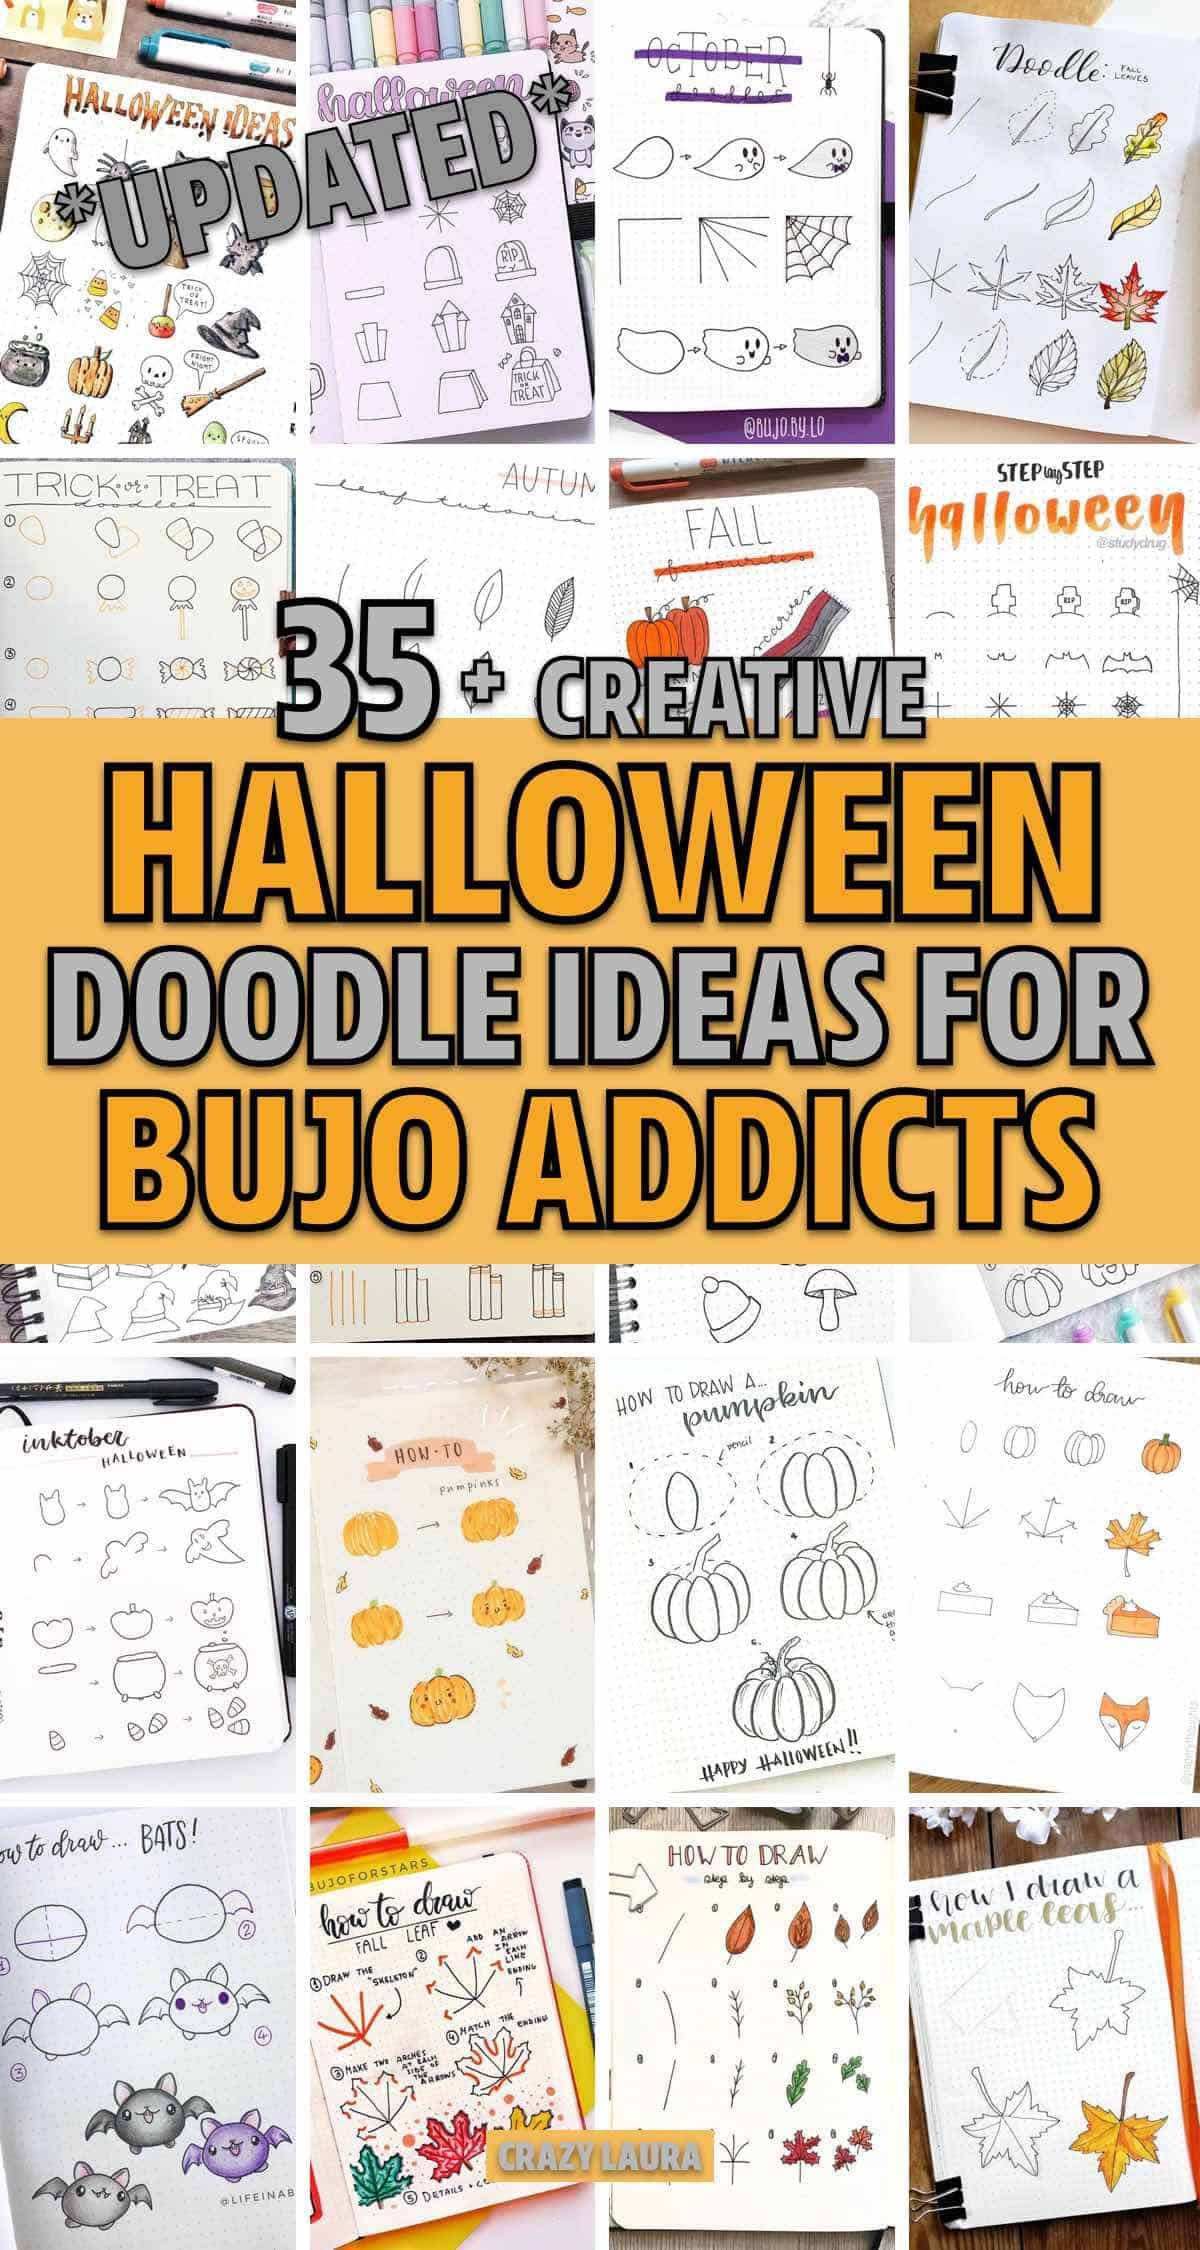 The best free halloween ecards found online. Best Bullet Journal Doodle Ideas For Halloween & Fall 2021 - Crazy Laura | Bullet journal ...